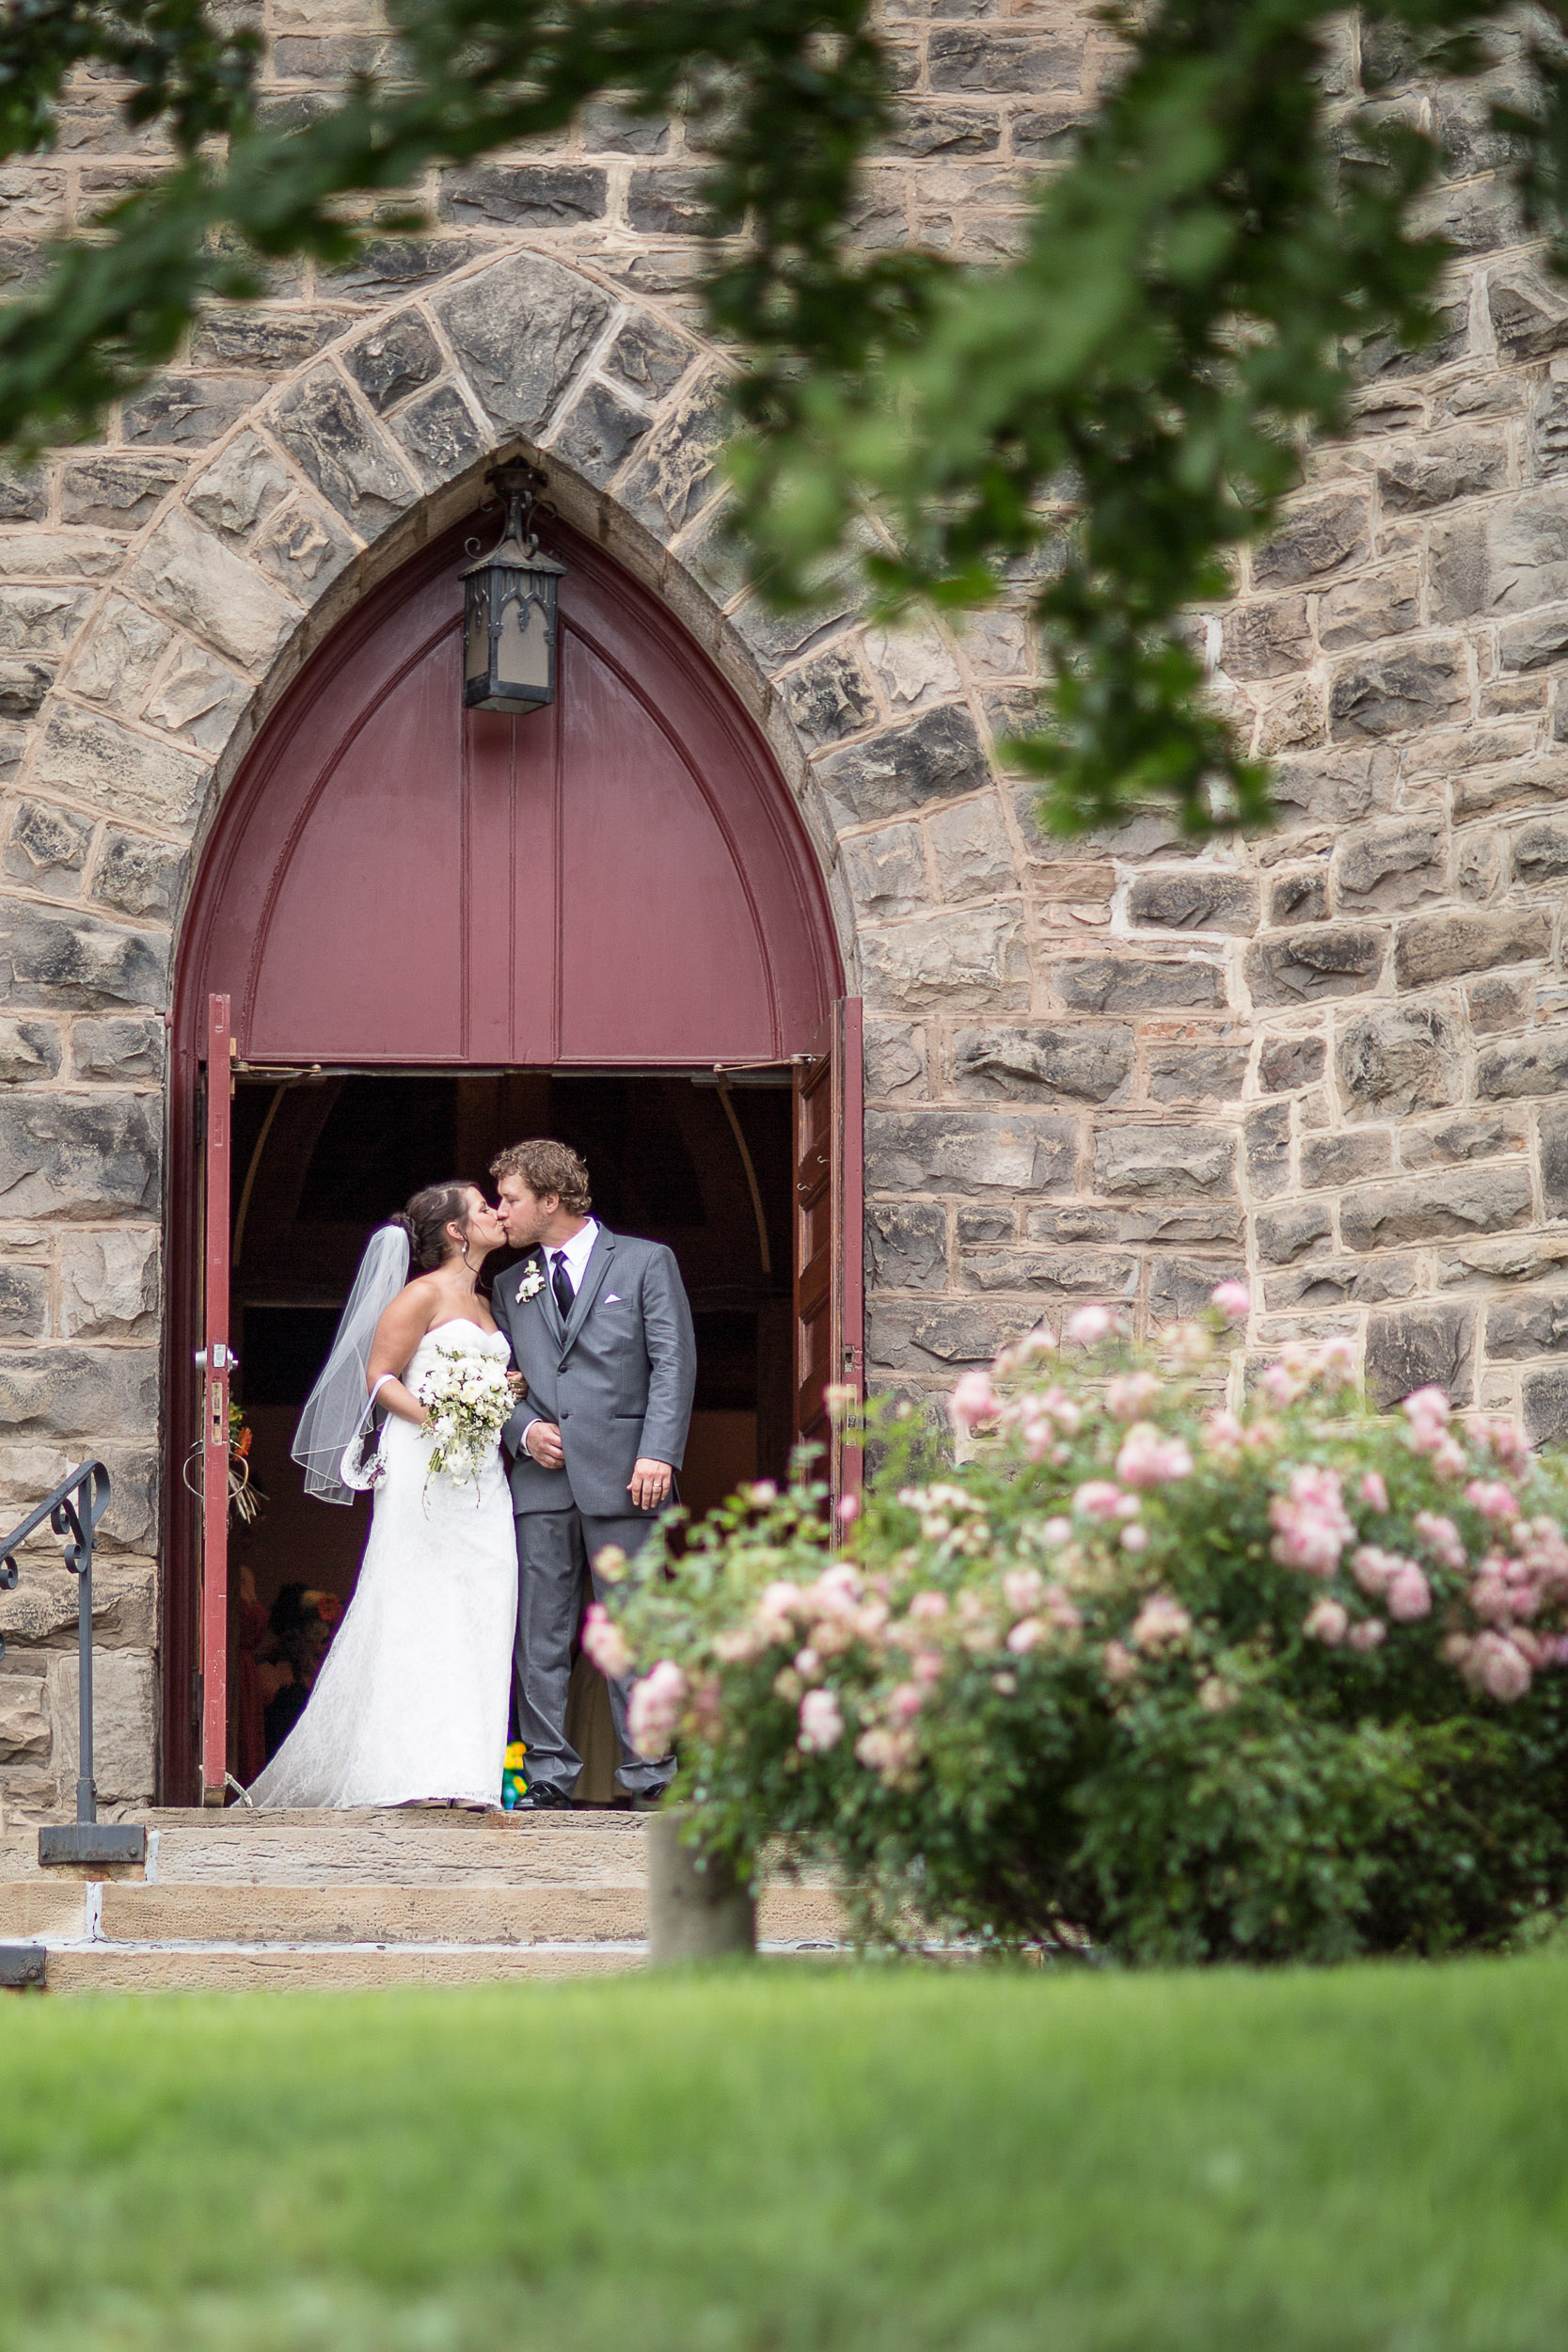 FumioWeddings - Real Weddings mixed-29.jpg